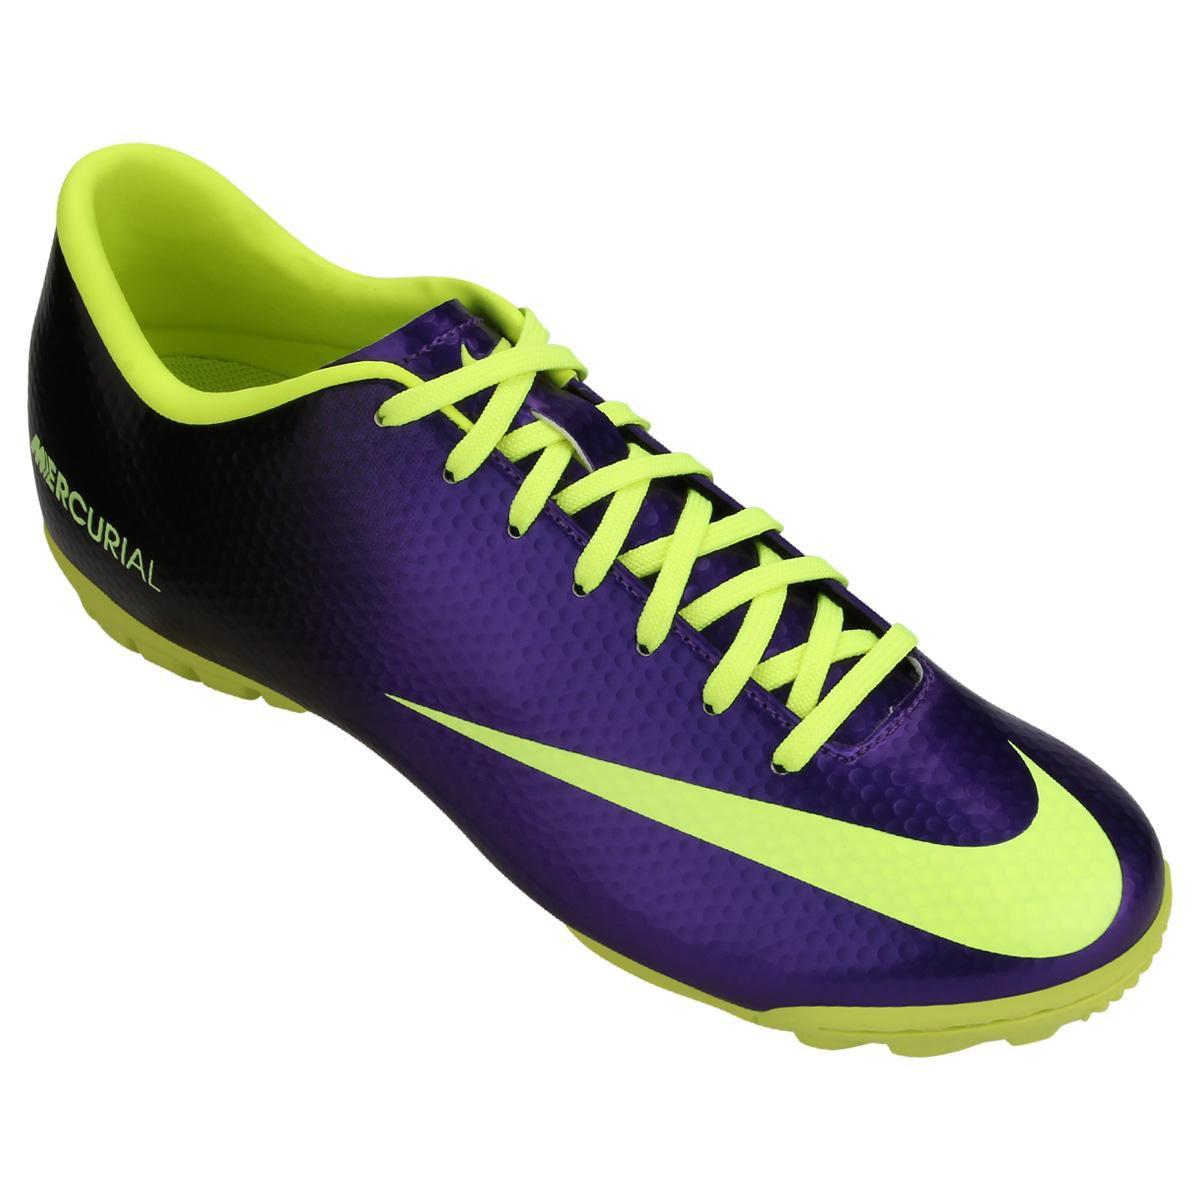 c00a62e82e Chuteira Society Nike Mercurial Victory 4 TF Masculina - Compre ...